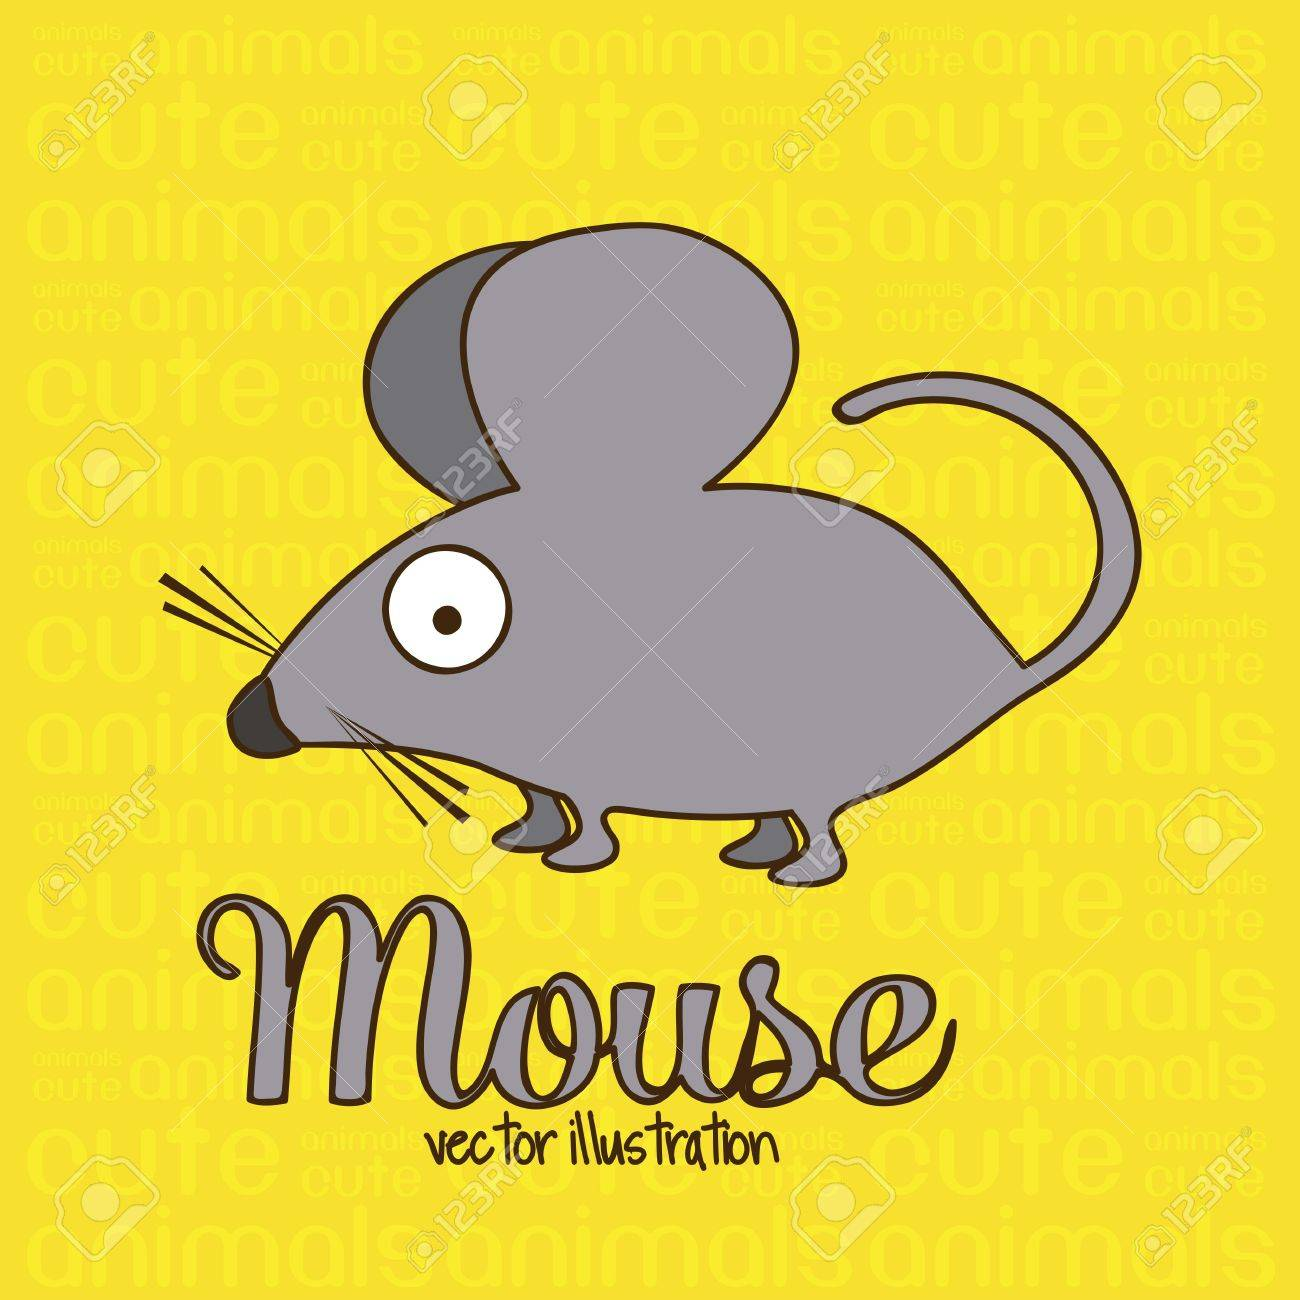 Illustration of Cute Animals. Mouse illustration. vector illustration Stock Vector - 17888863